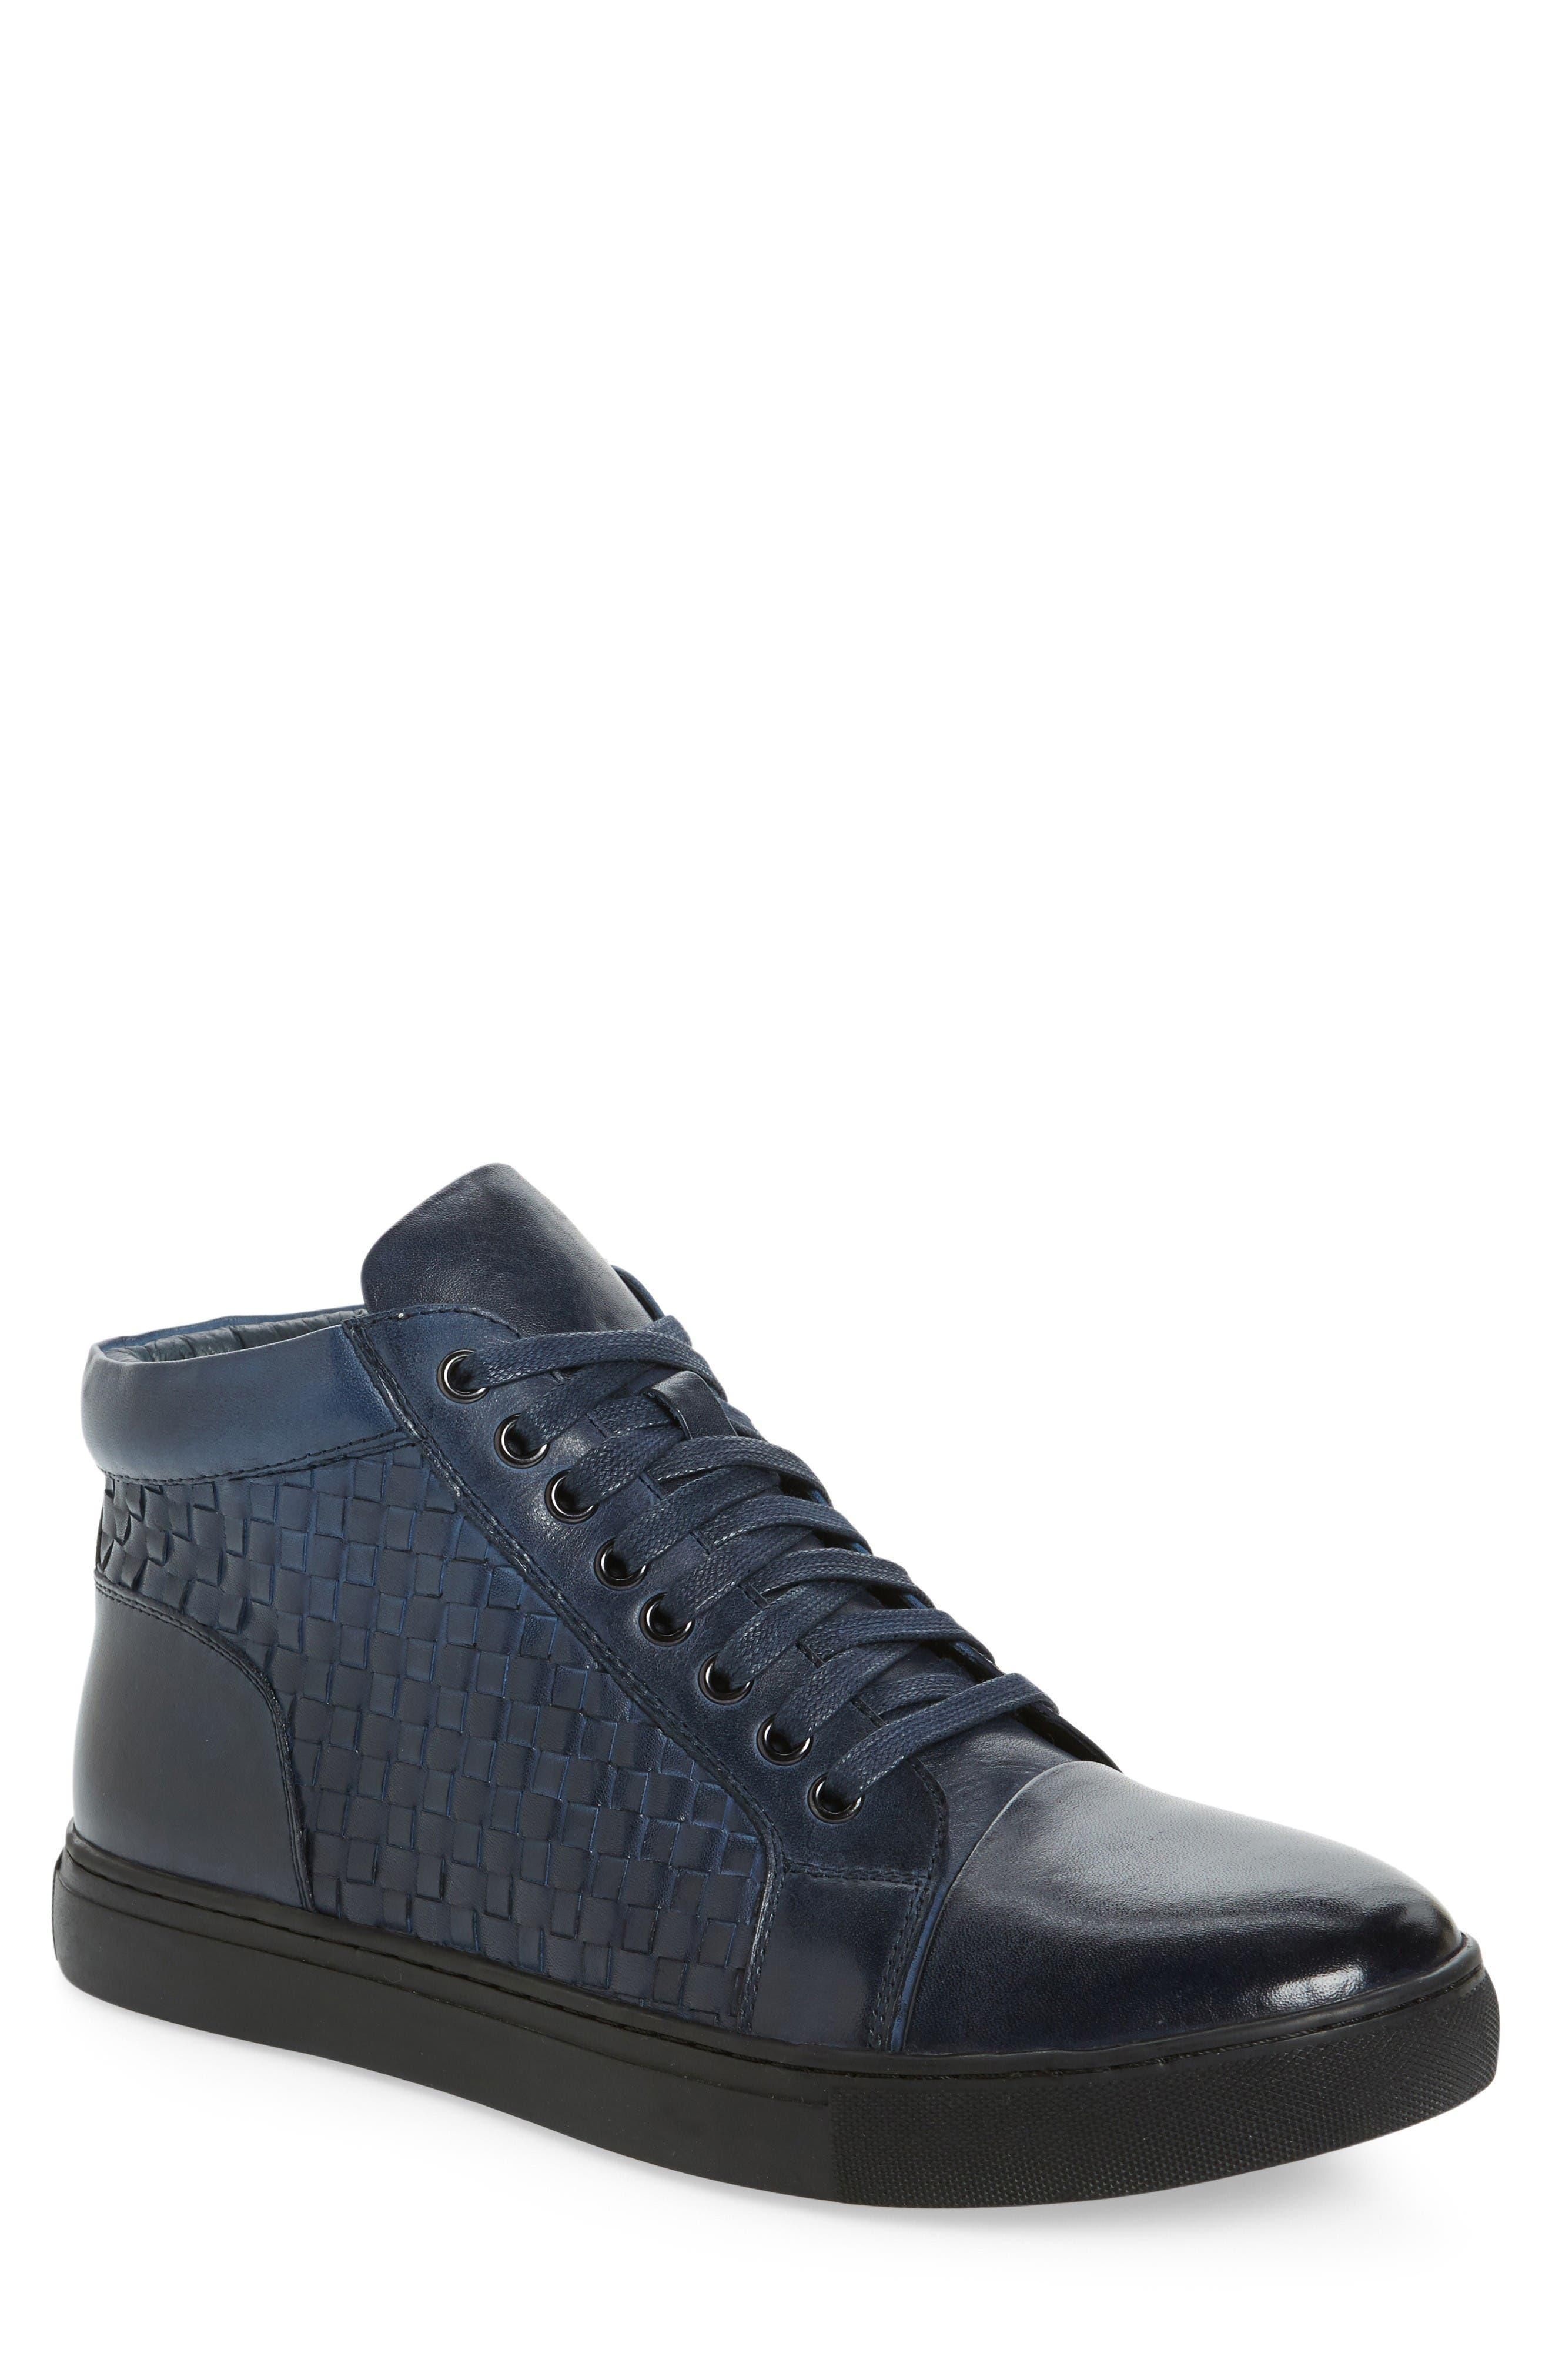 Alternate Image 1 Selected - Zanzara Soul High Top Sneaker (Men)